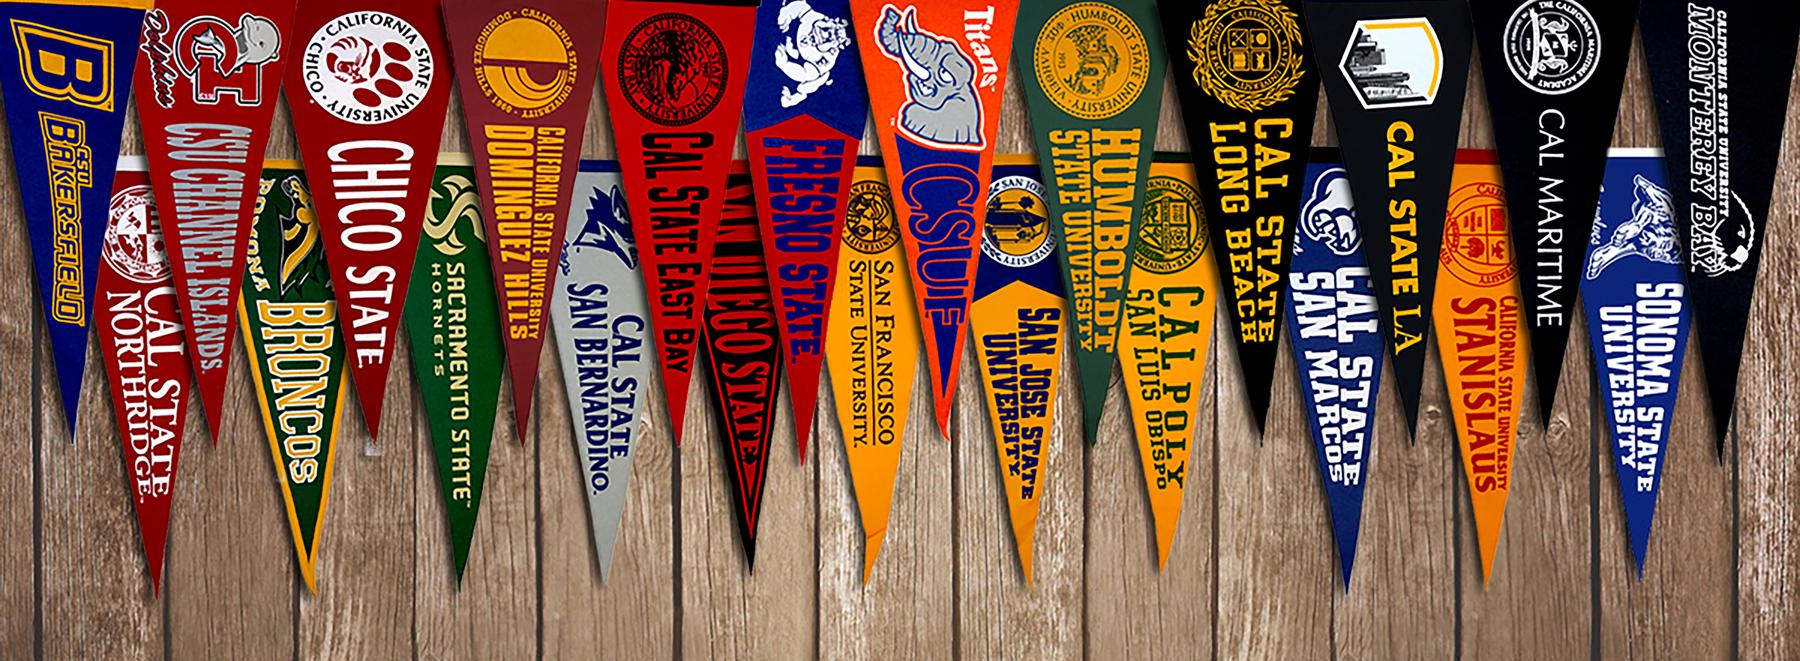 California State University Flags